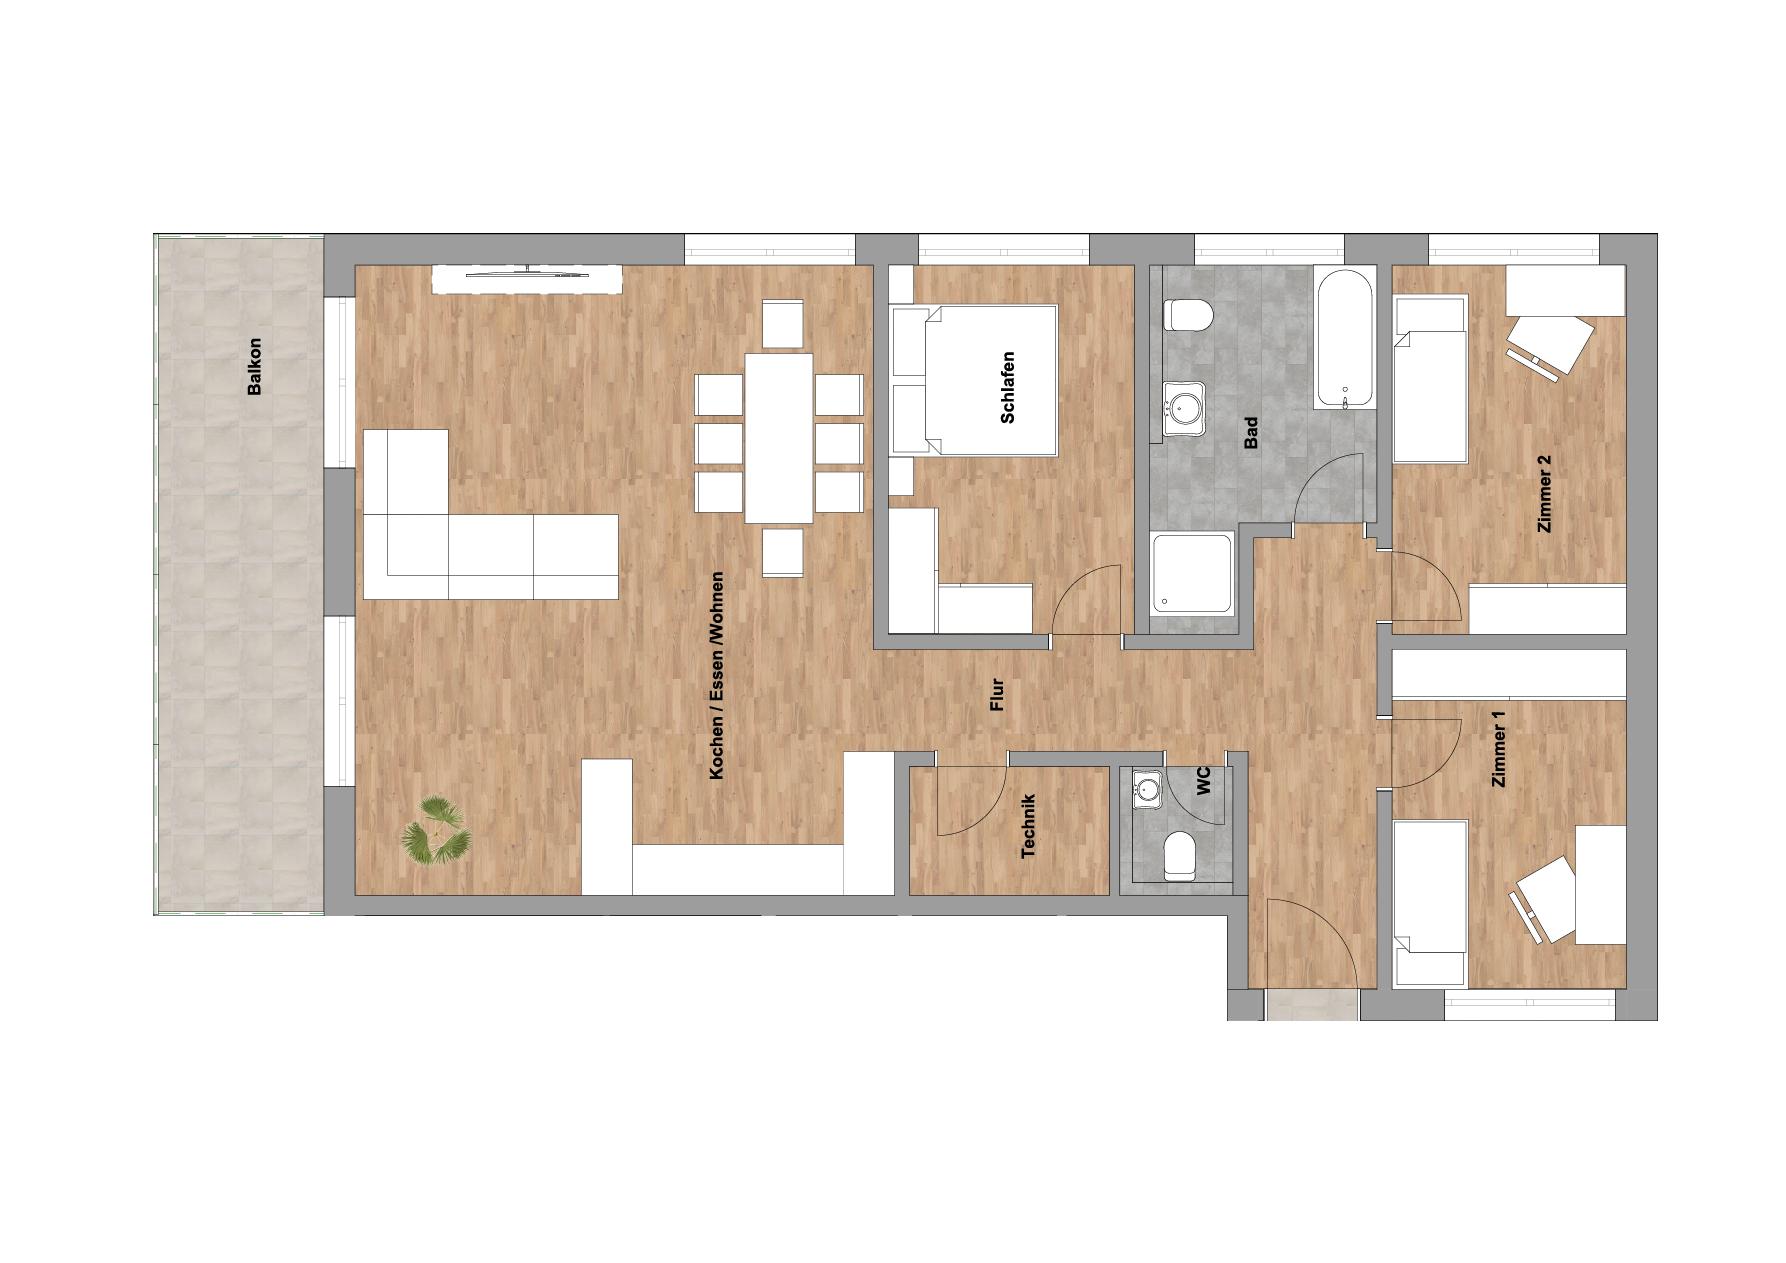 infoScout Neubau Projekt Ittersbach Wohnung 8